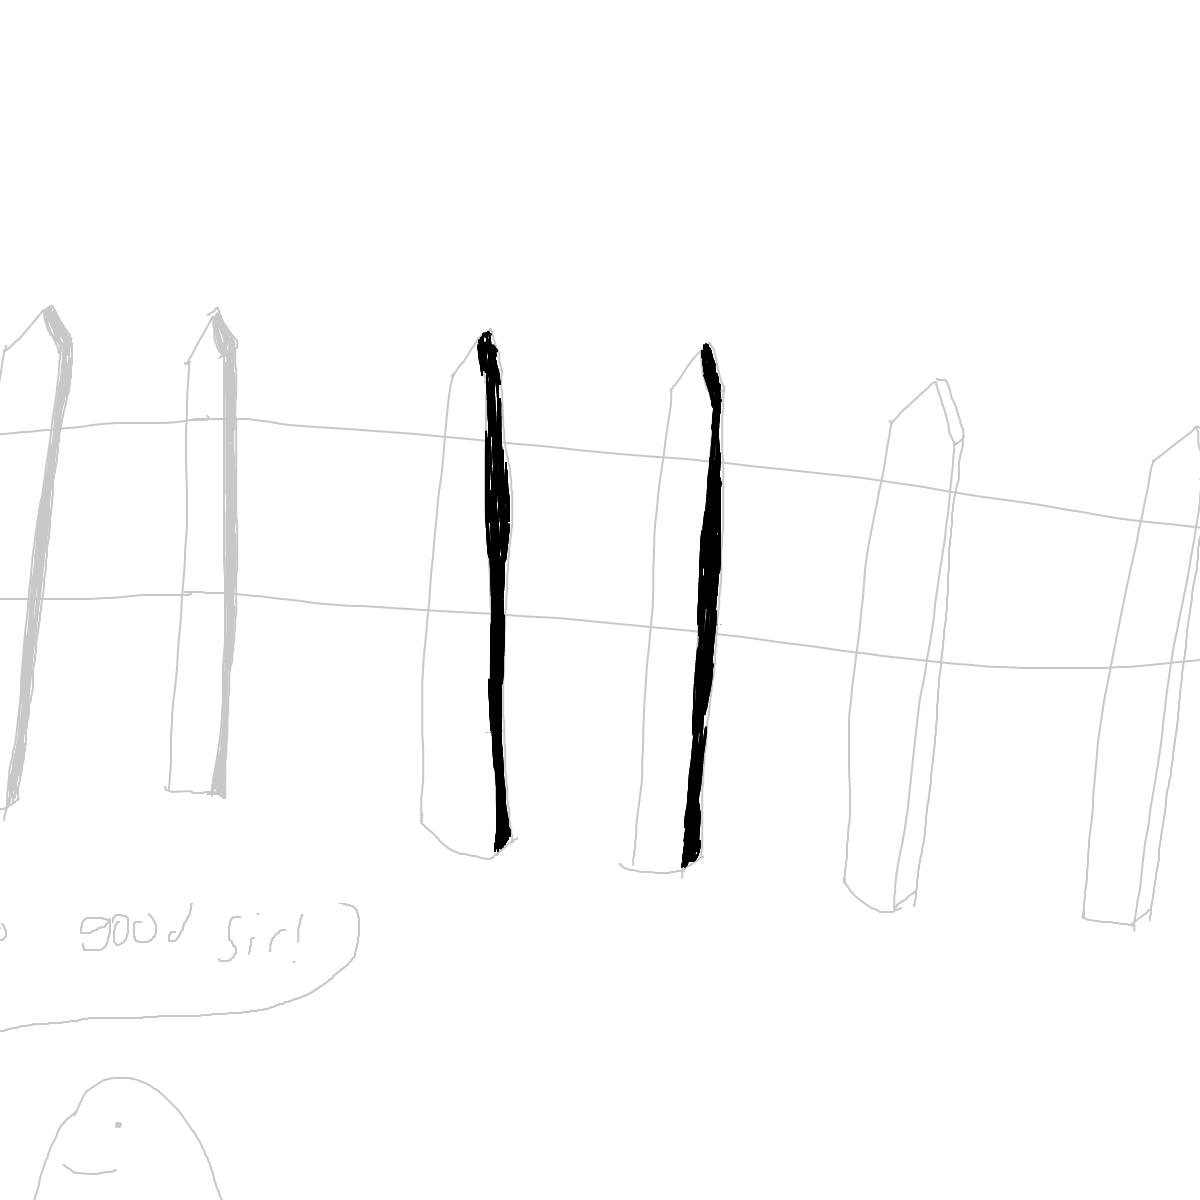 BAAAM drawing#9744 lat:52.4750747680664060lng: 13.4067773818969730